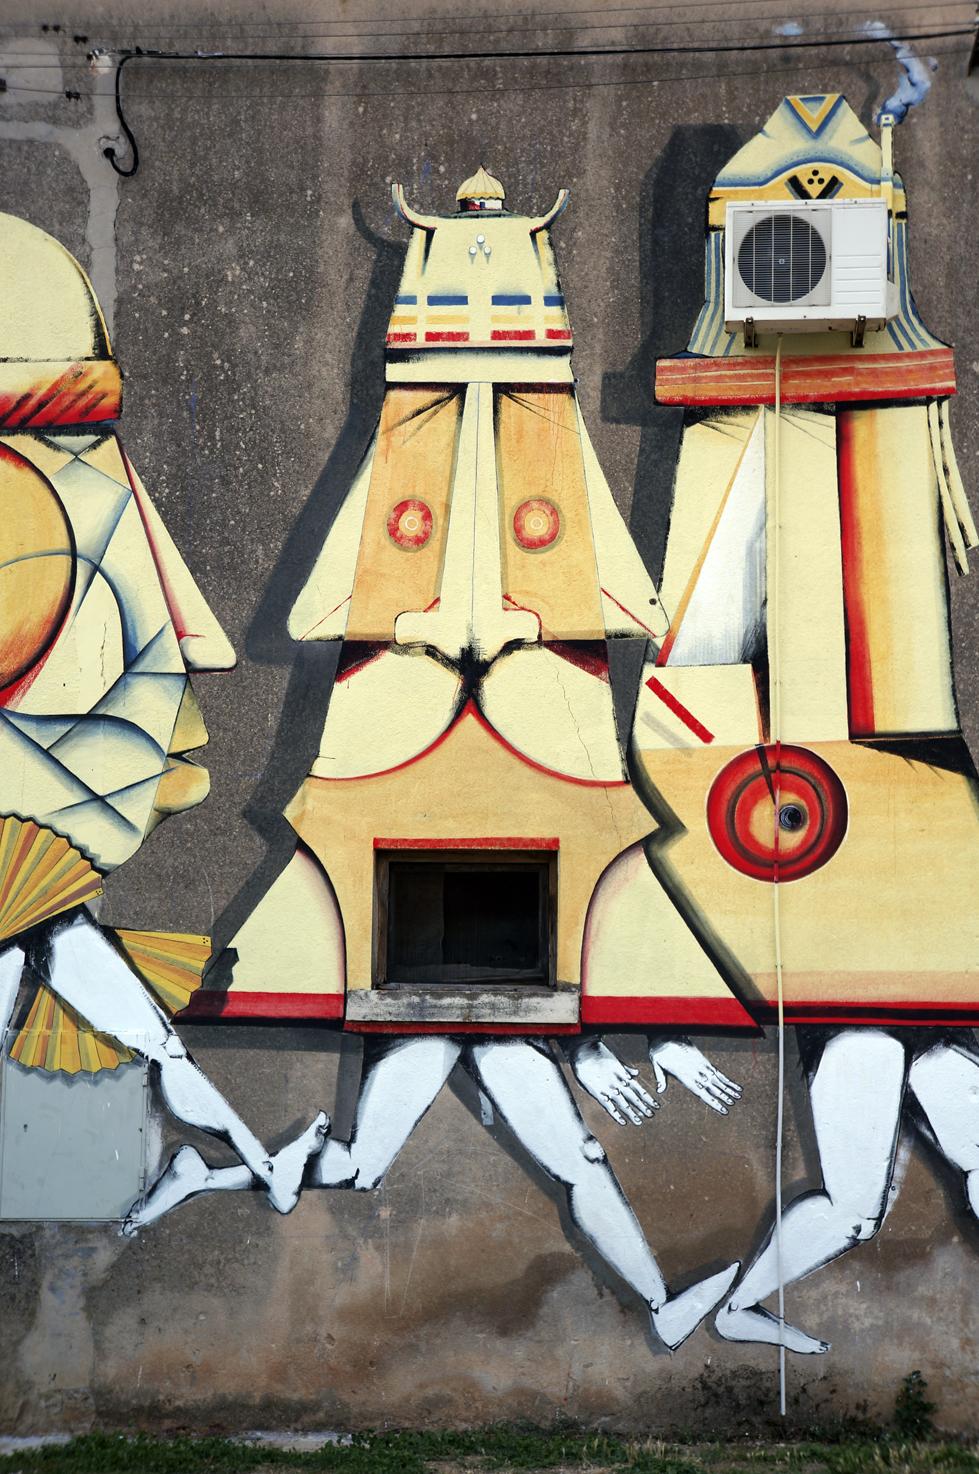 run-new-mural-at-boombarstick-festival-2014-04